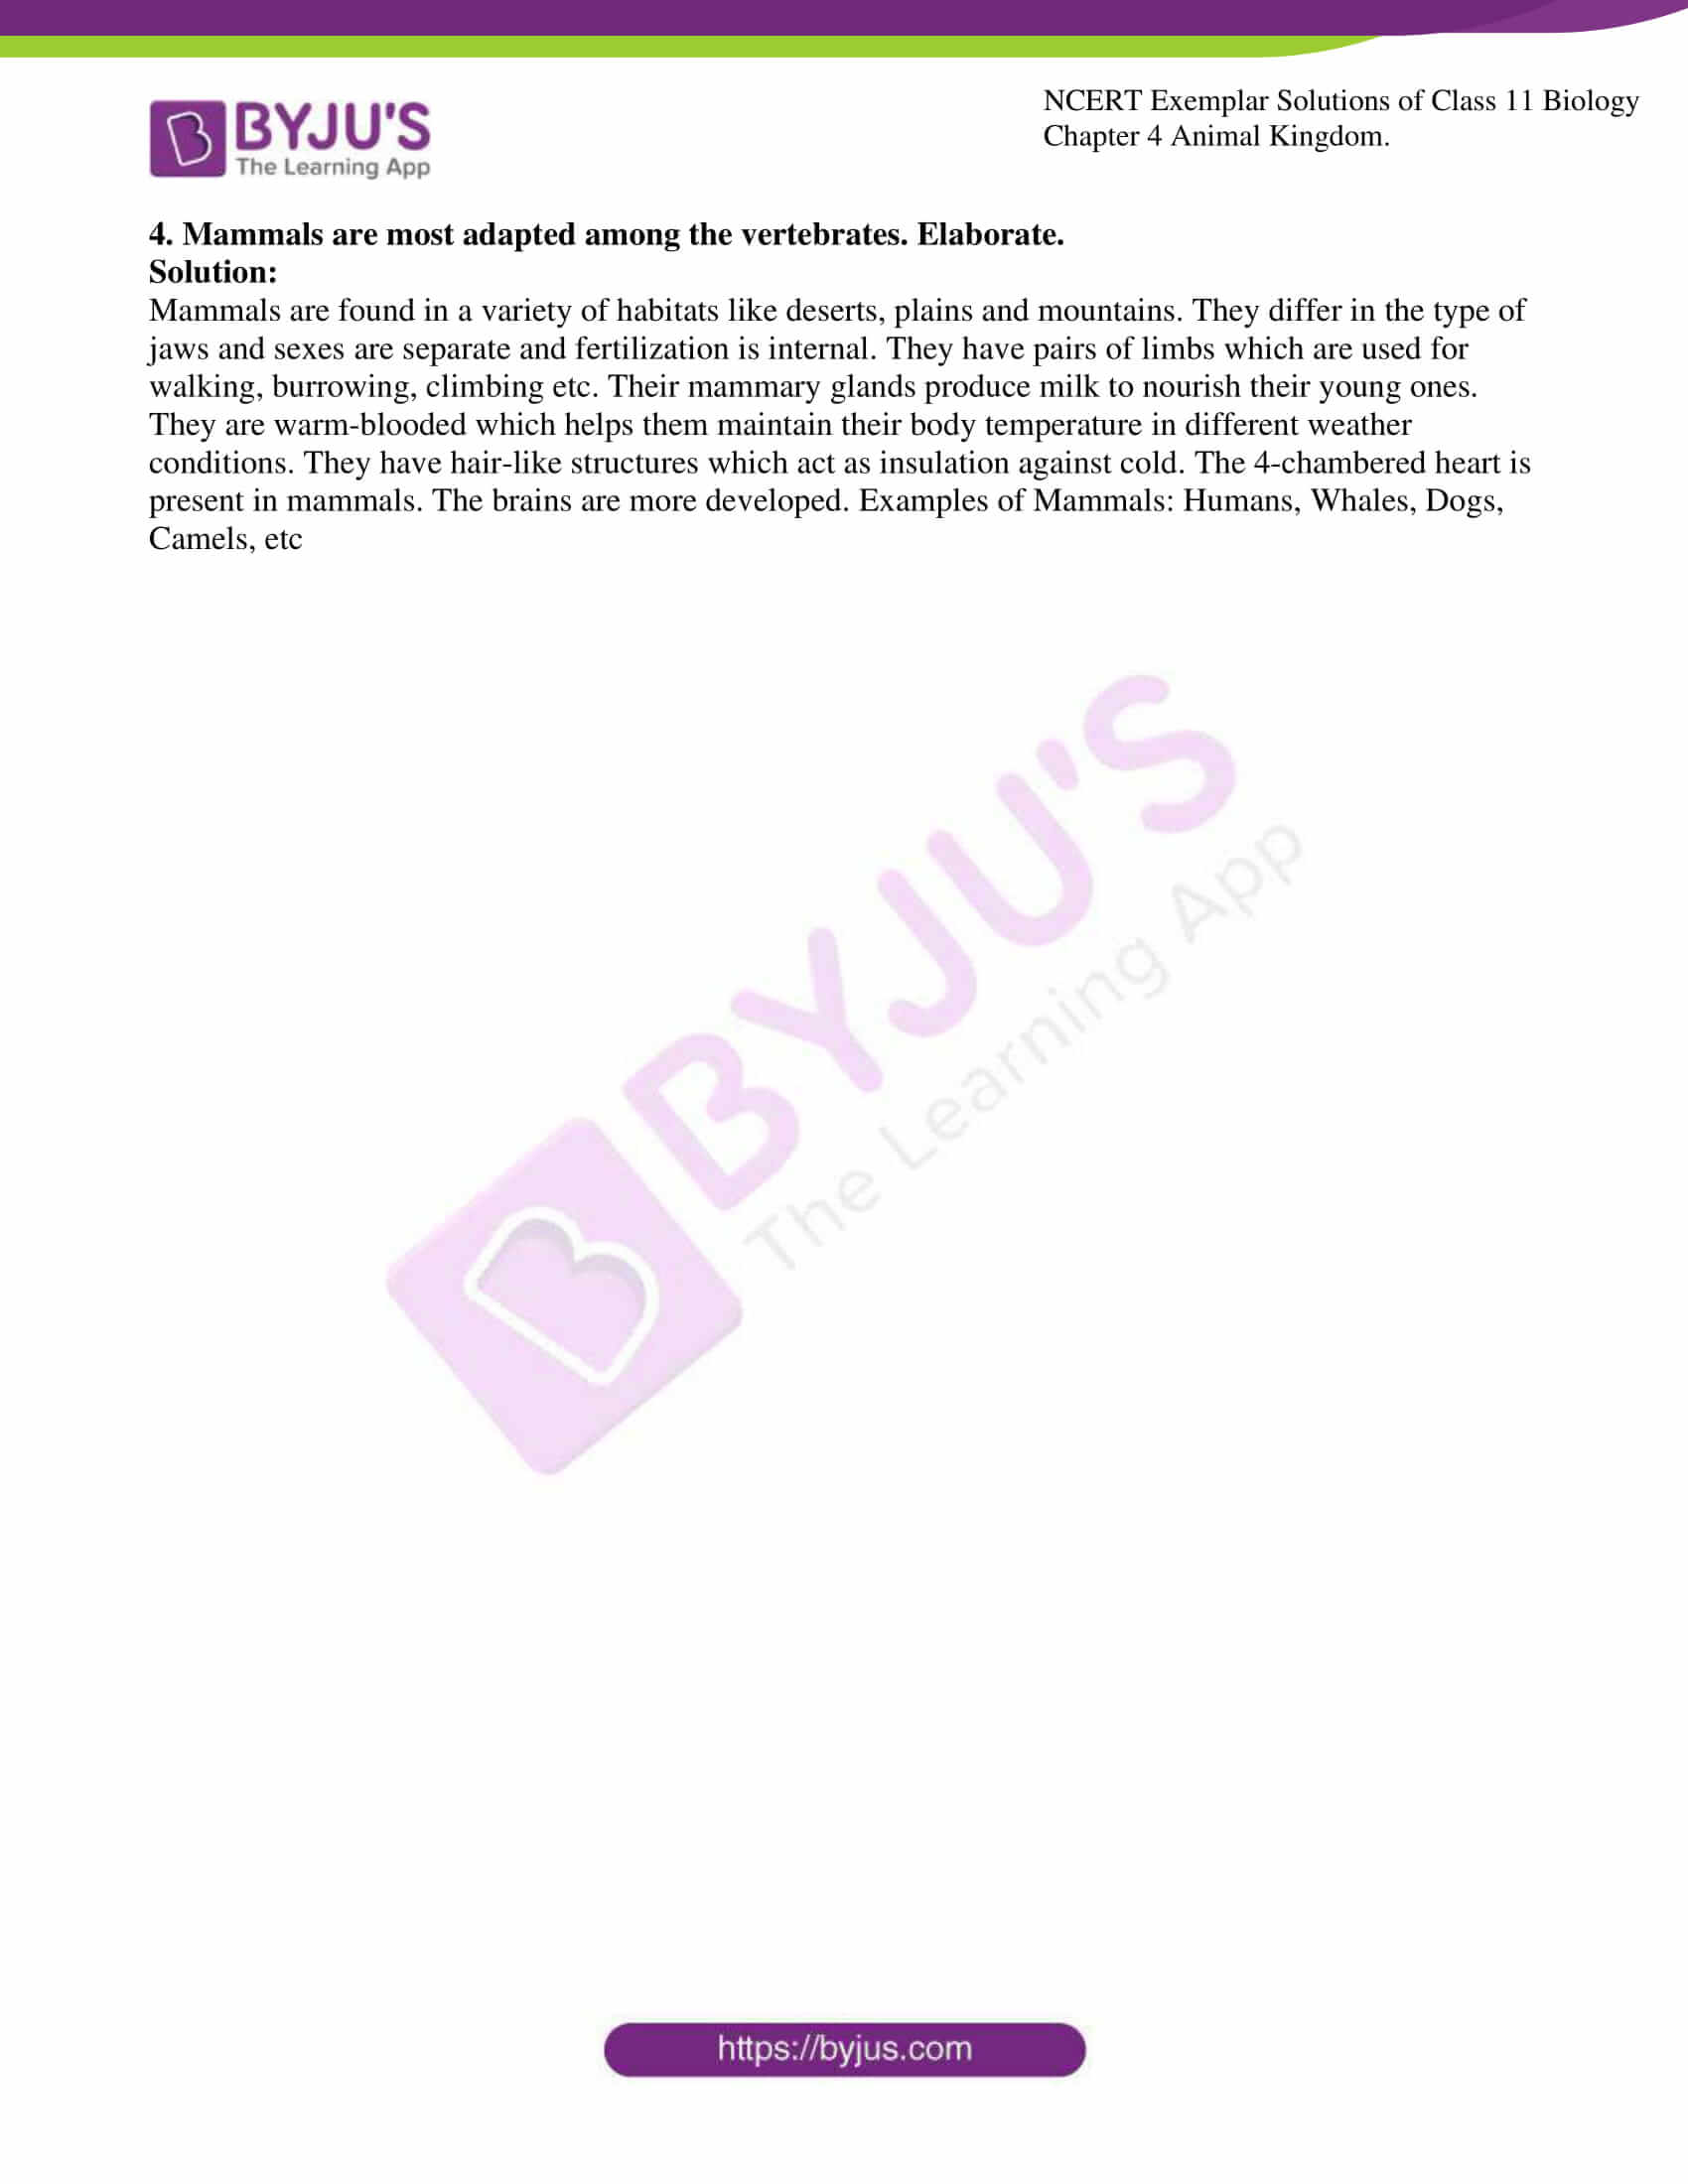 ncert exemplar solutions for class 11 bio chapter 4 11